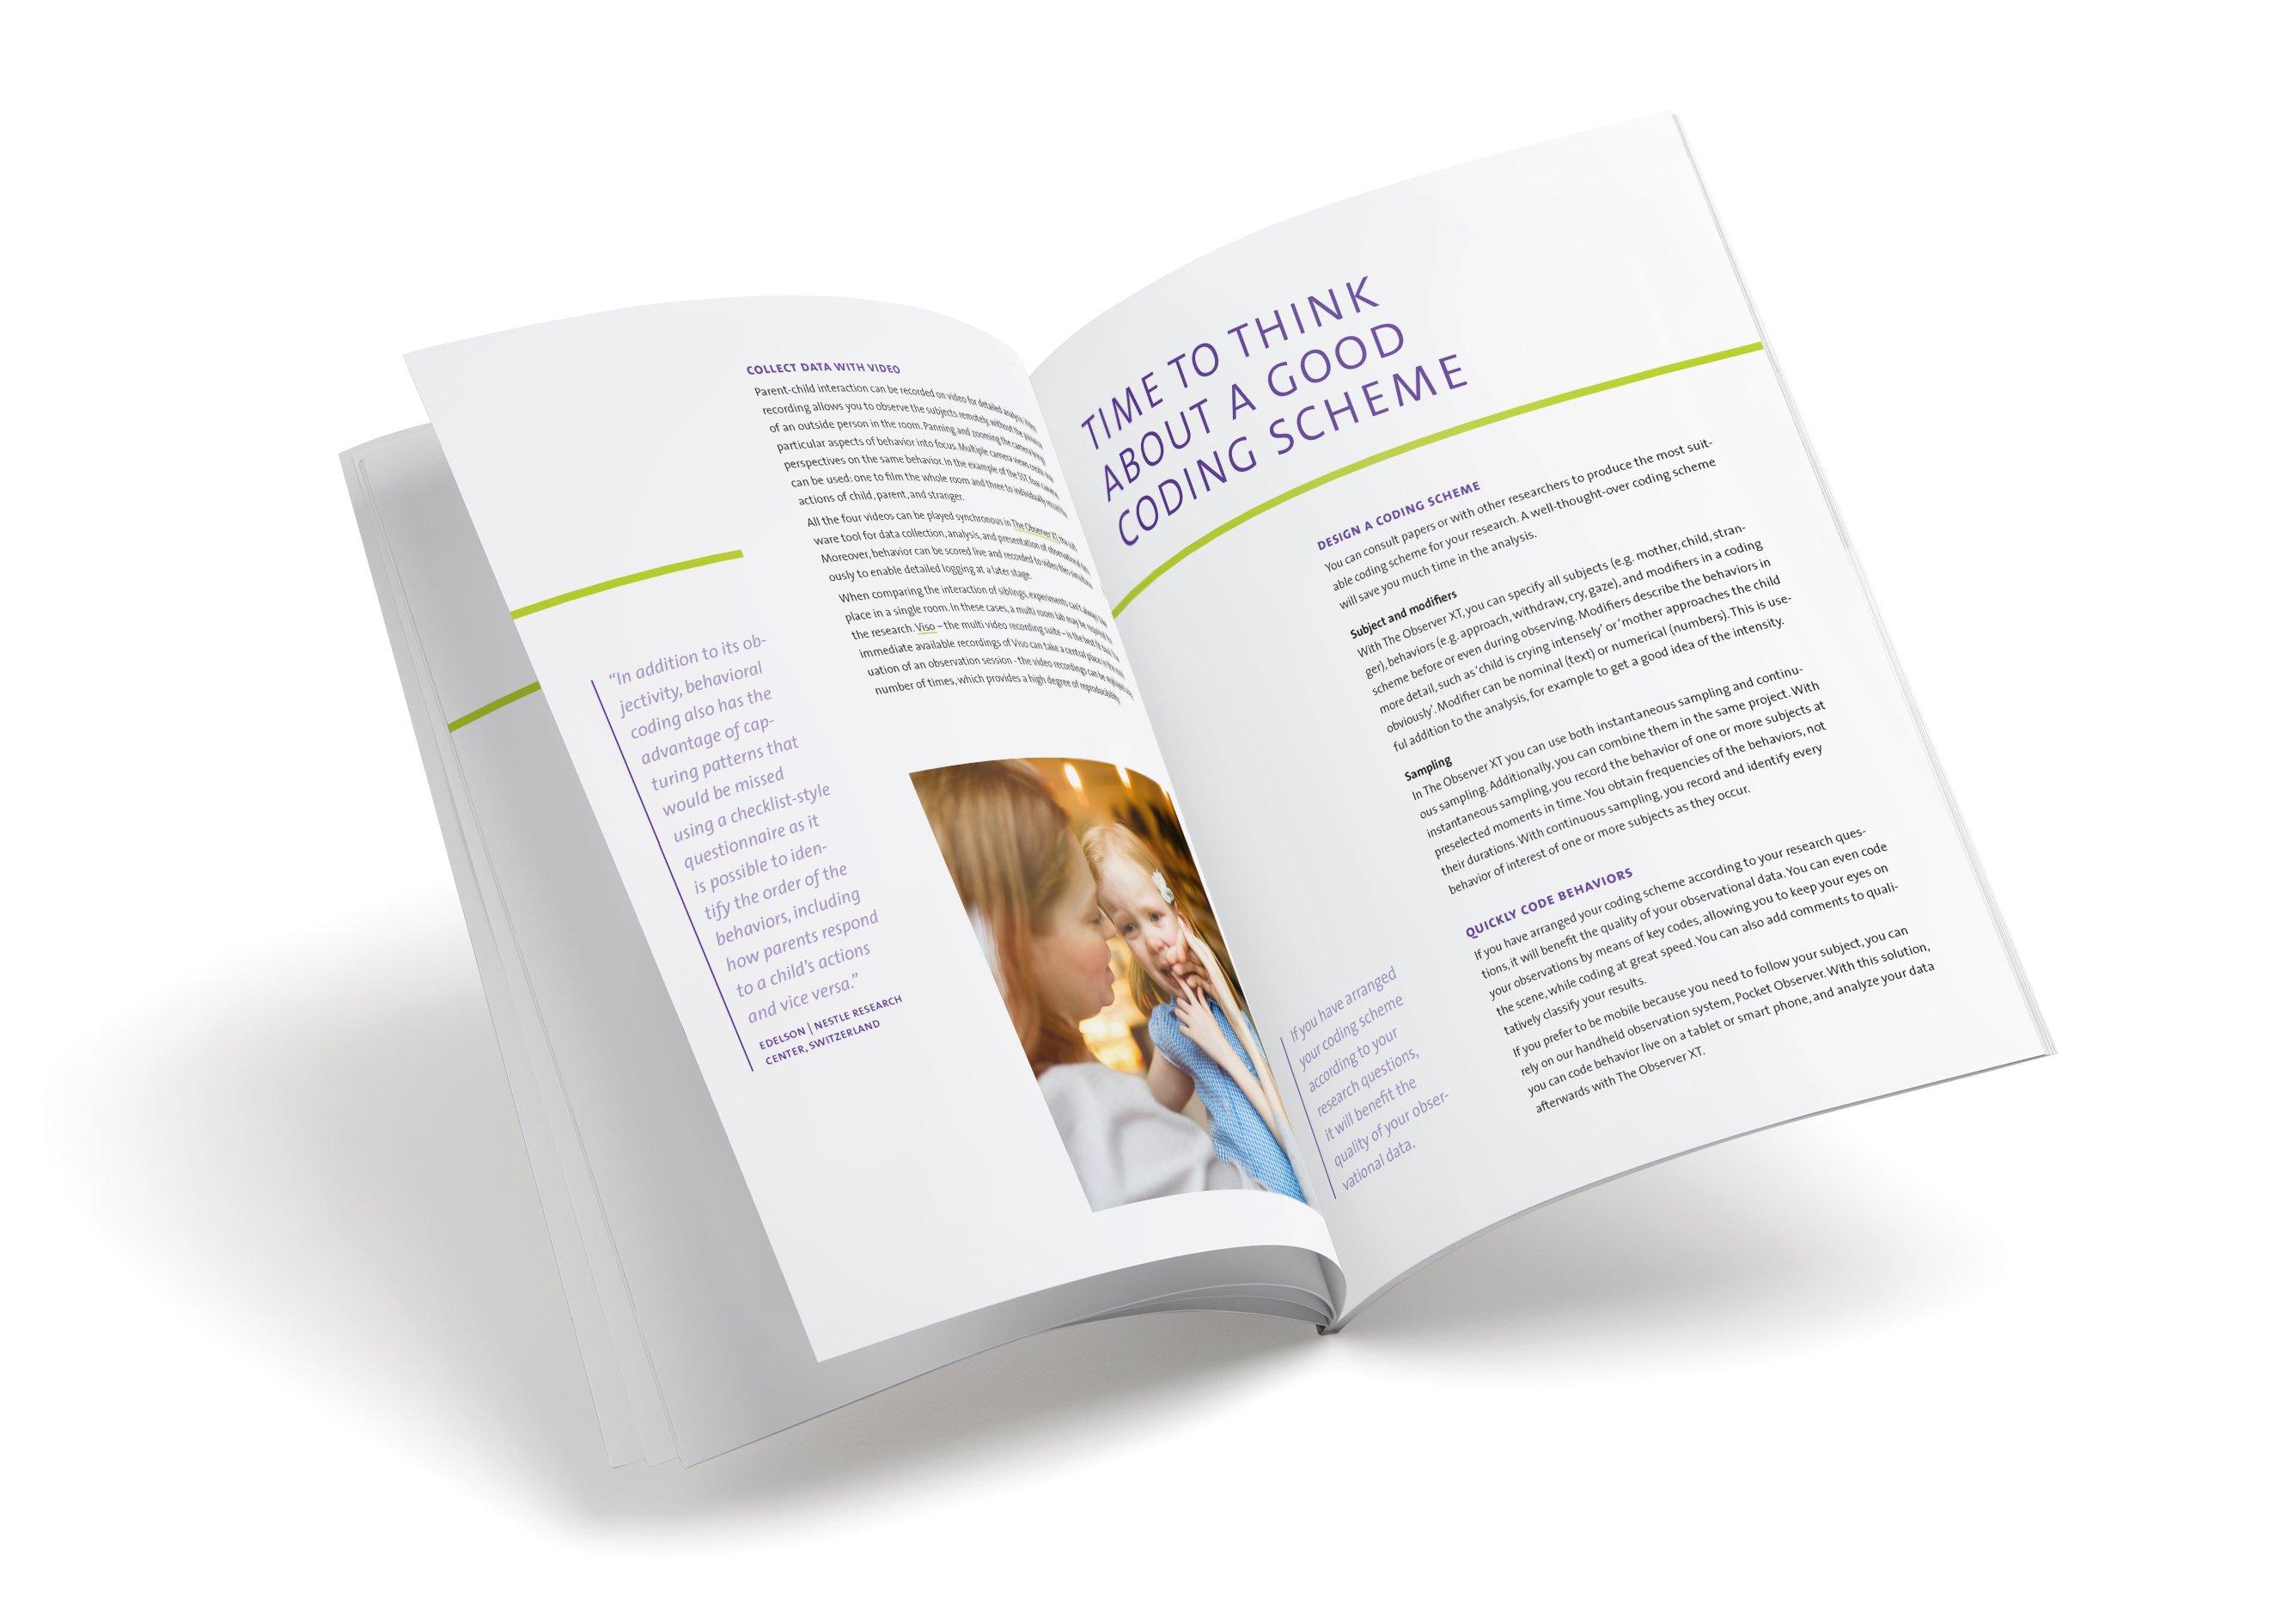 White paper - Parent-Child Interaction - www